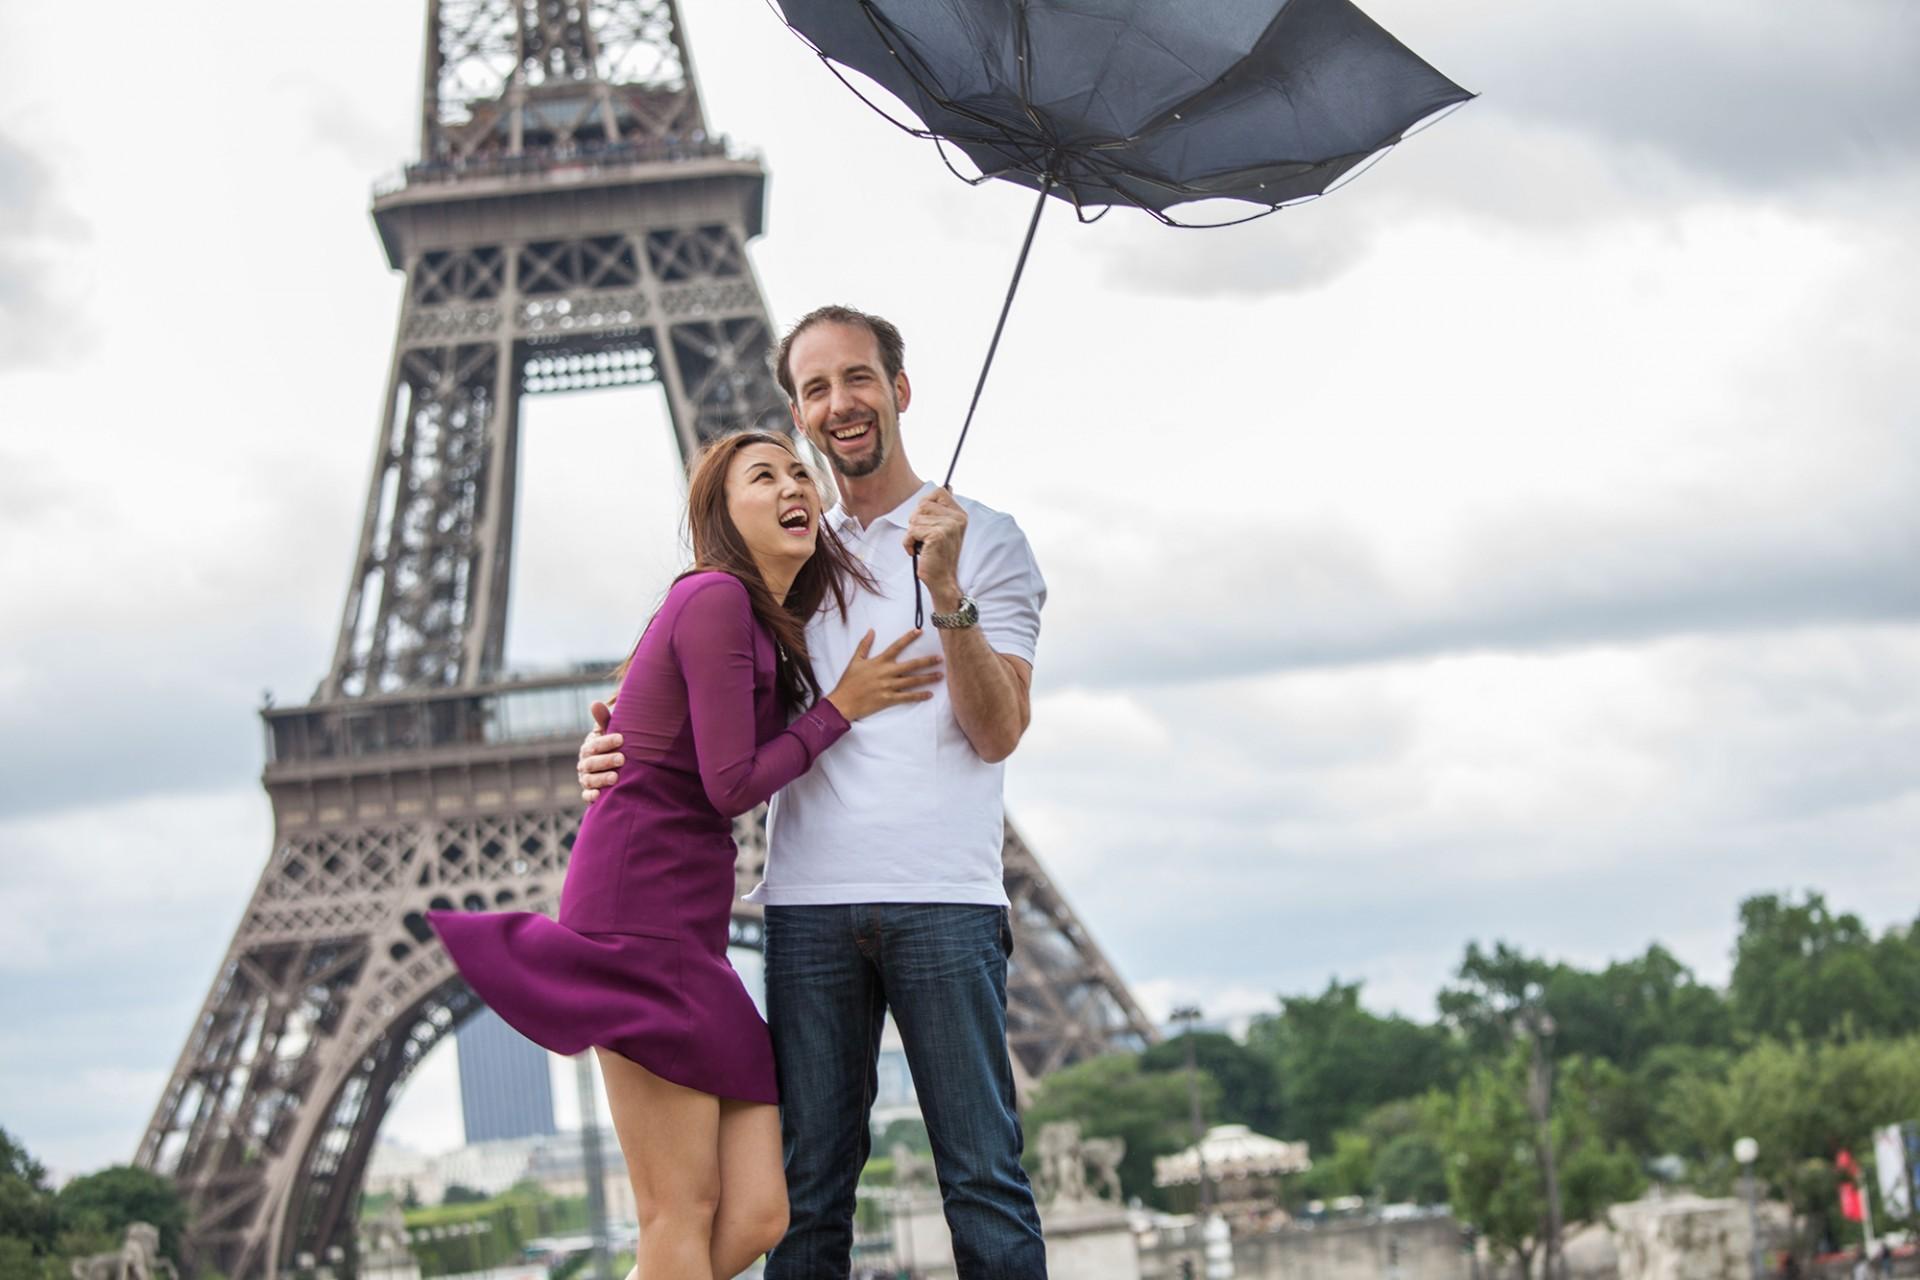 Katalog Fotoshooting Liebespaar am Eiffelturm